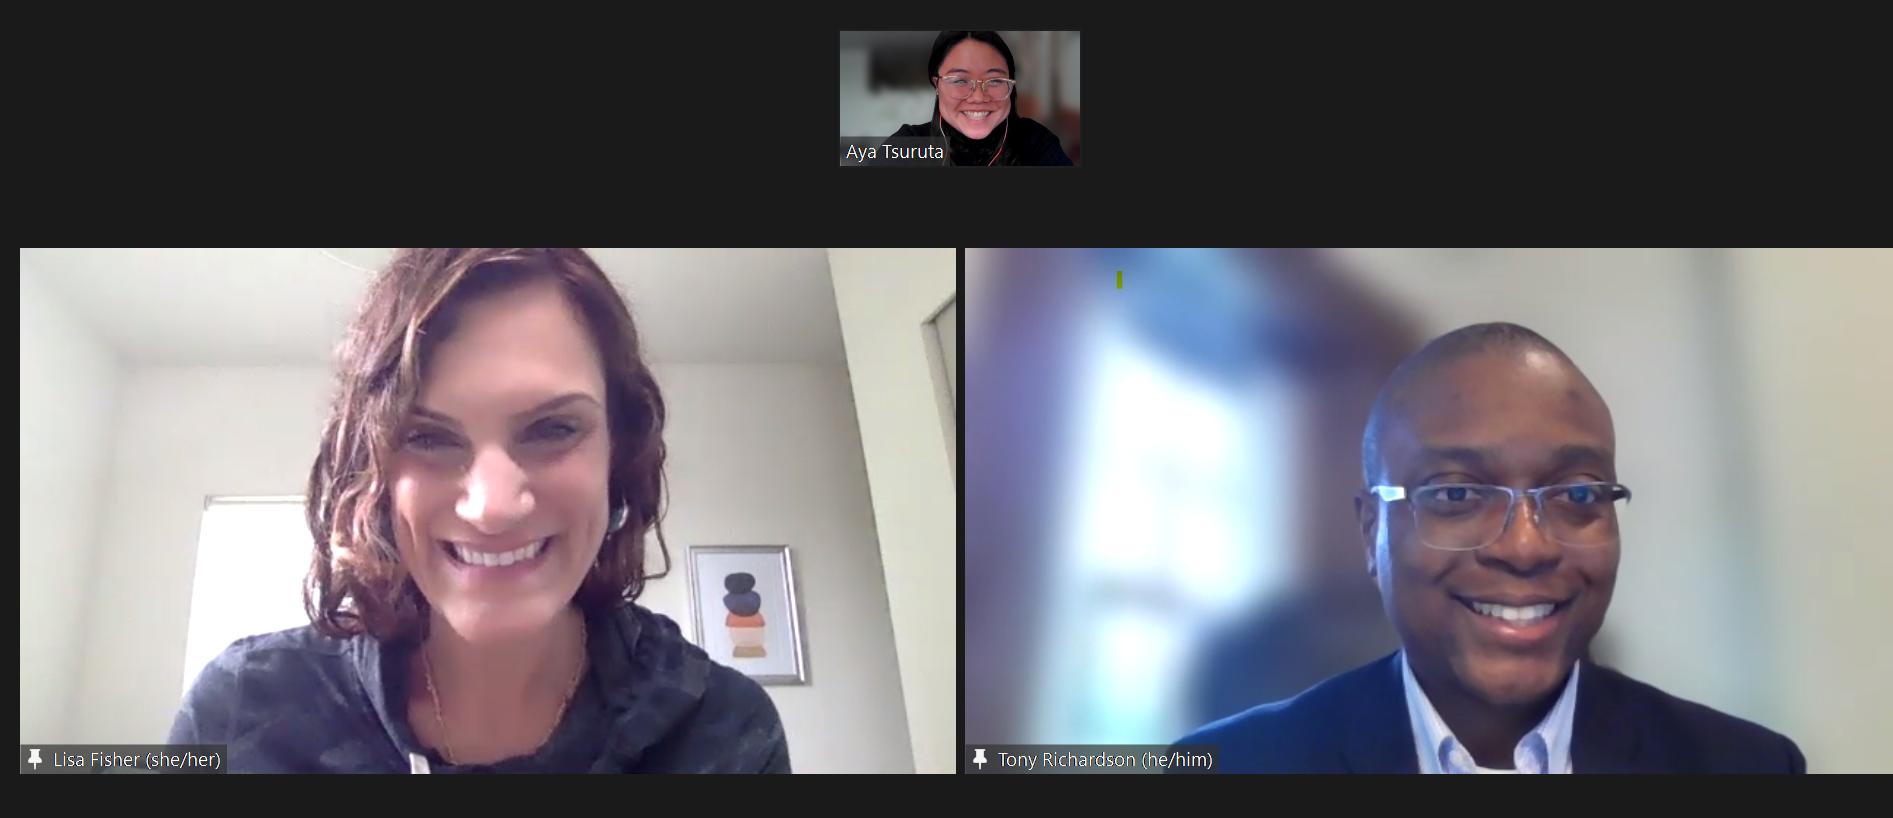 Screenshot image of Zoom video screen with Lisa, Tony and Aya.